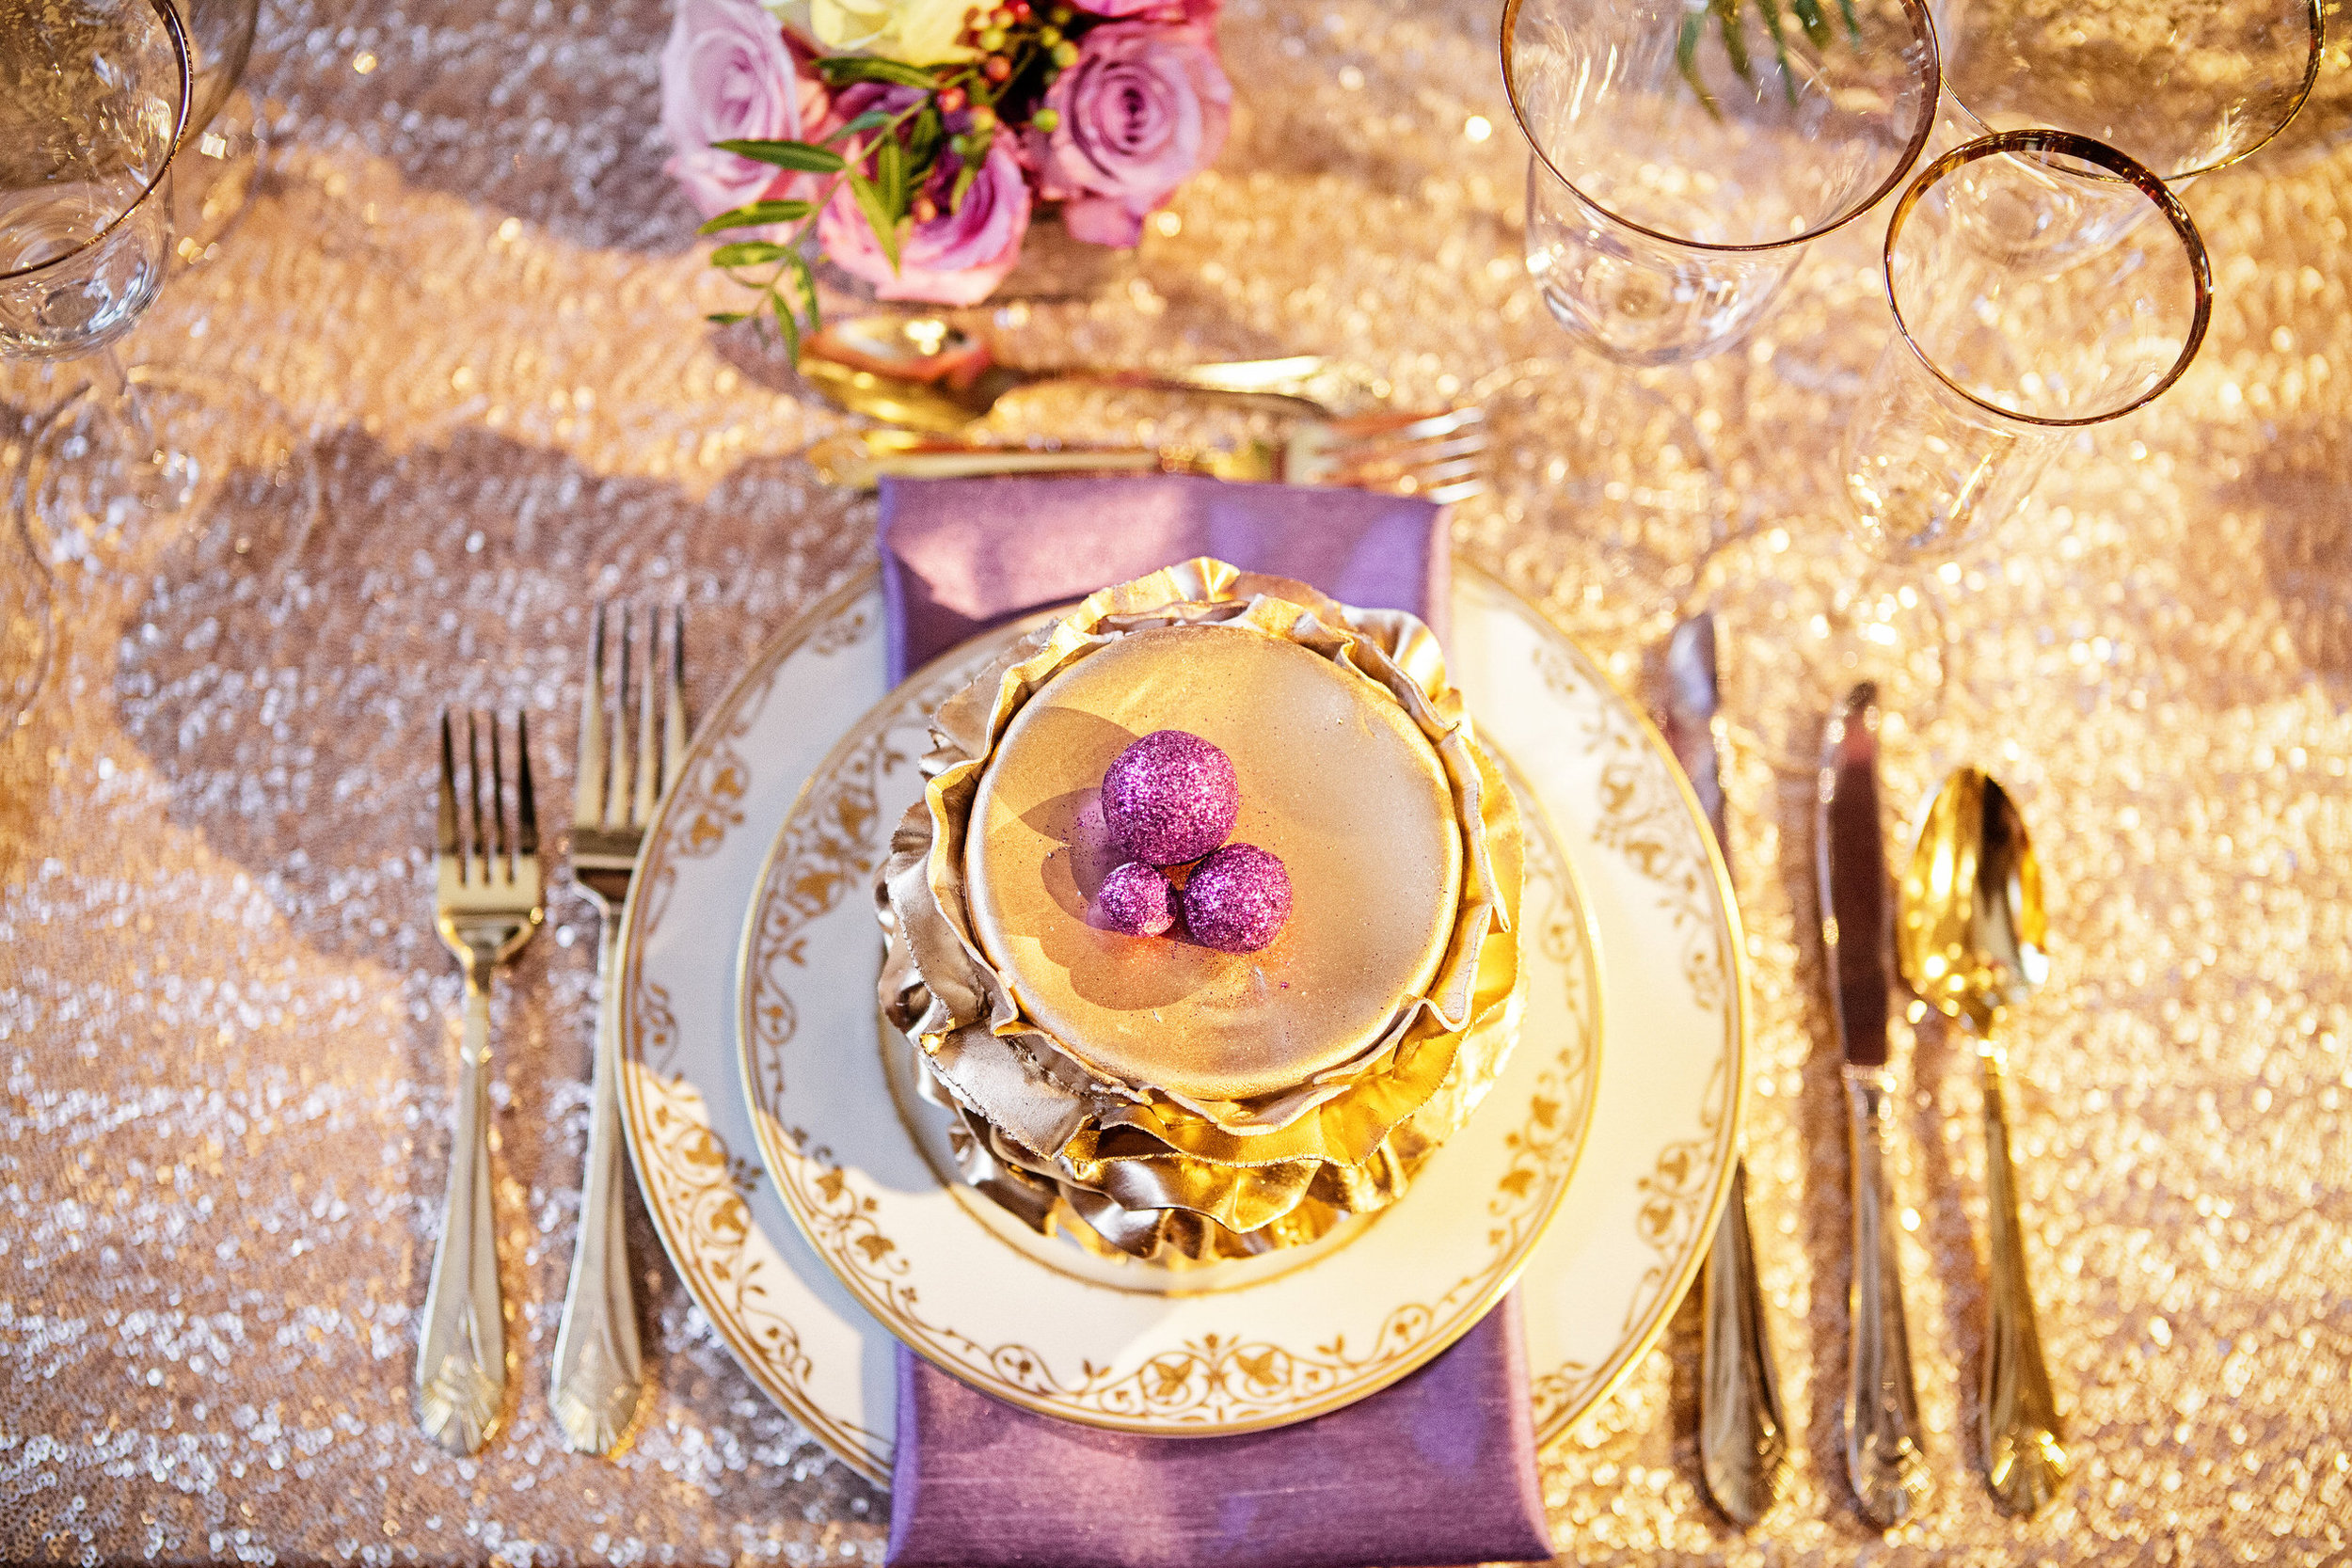 13 Gold Ruffled Cake Place Setting Gold Sequin Radiant Orchid Philadelphia Wedding Designer.jpg